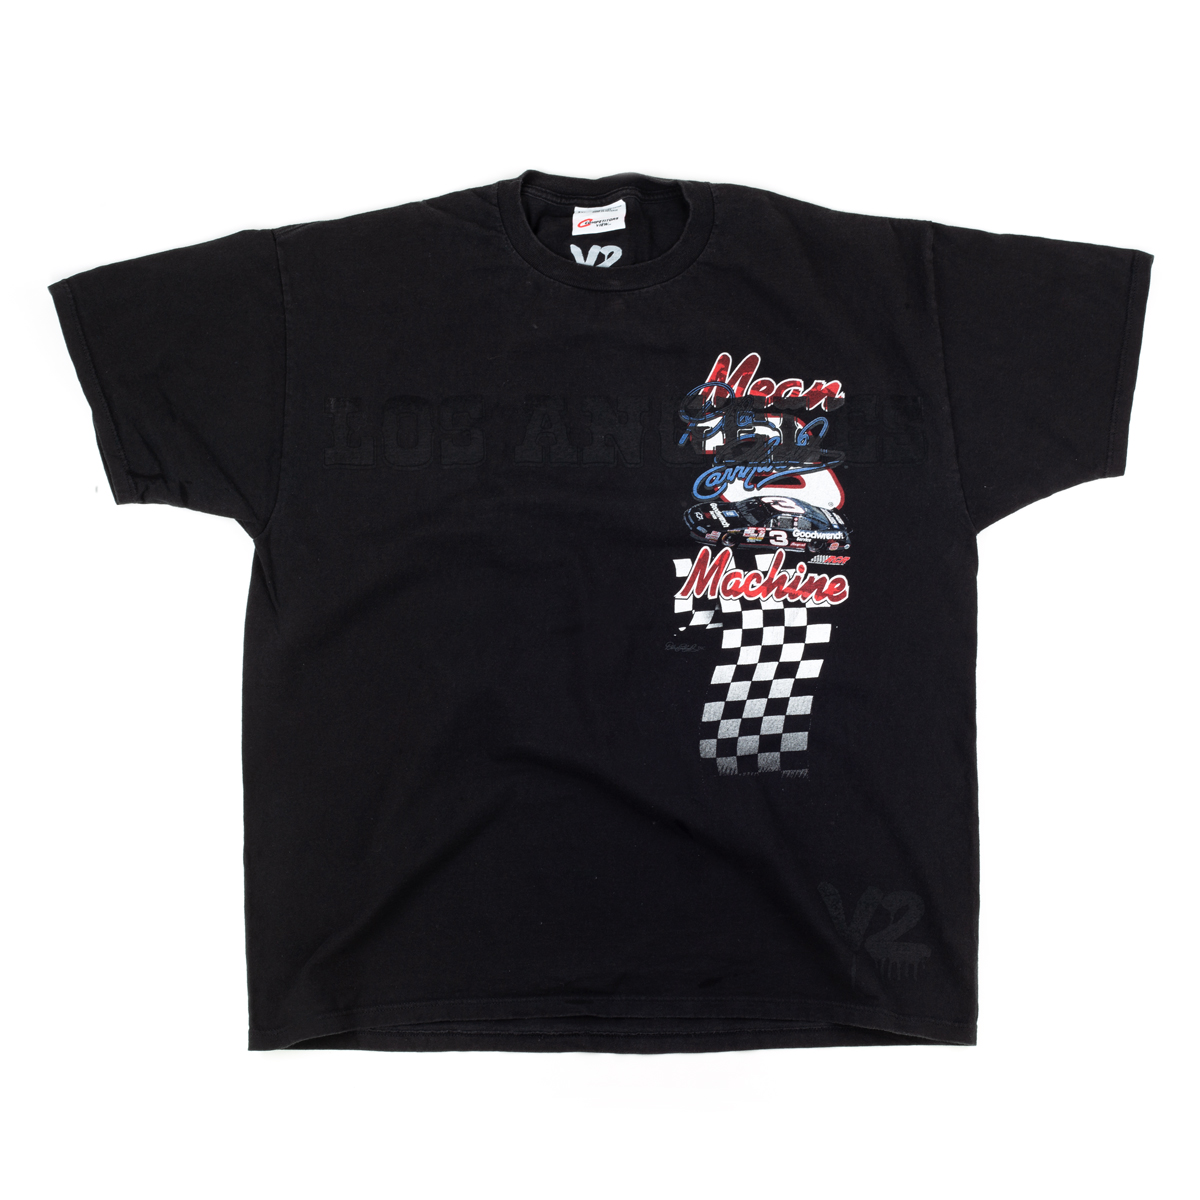 Los Angeles T-Shirt (2XL)